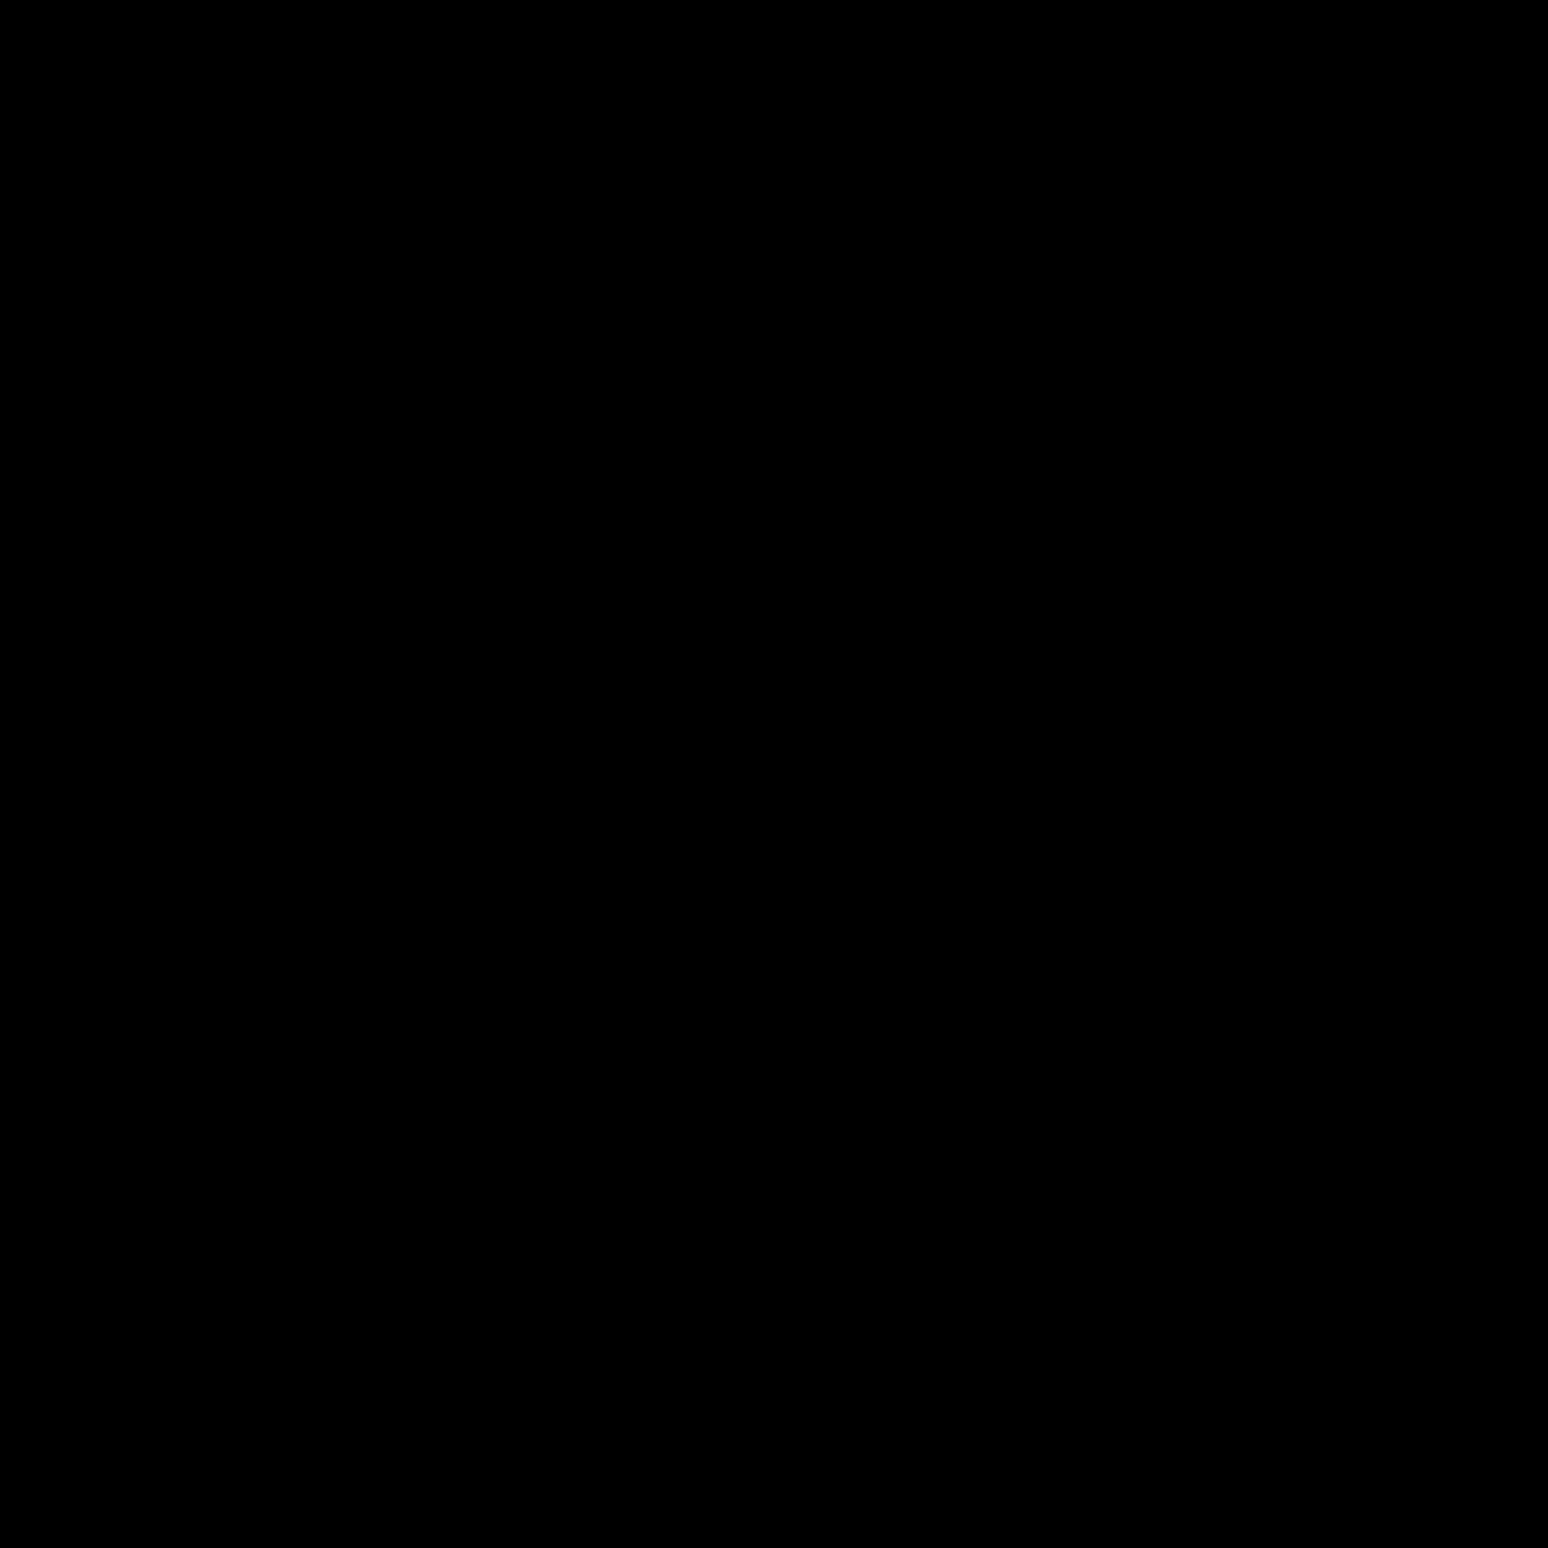 logo Petit Vestiaire